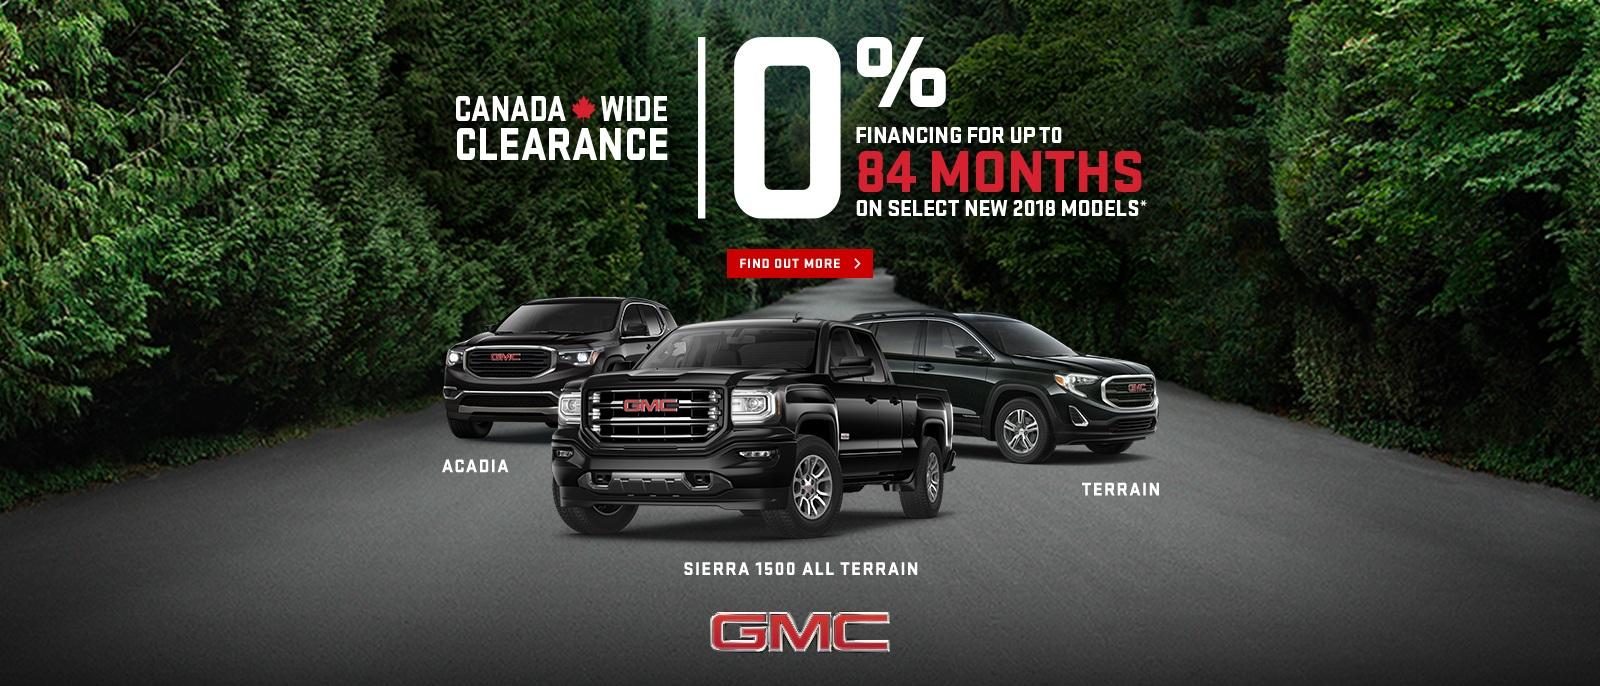 Northstar GM: New & Used GM Dealership | Cranbrook, BC.